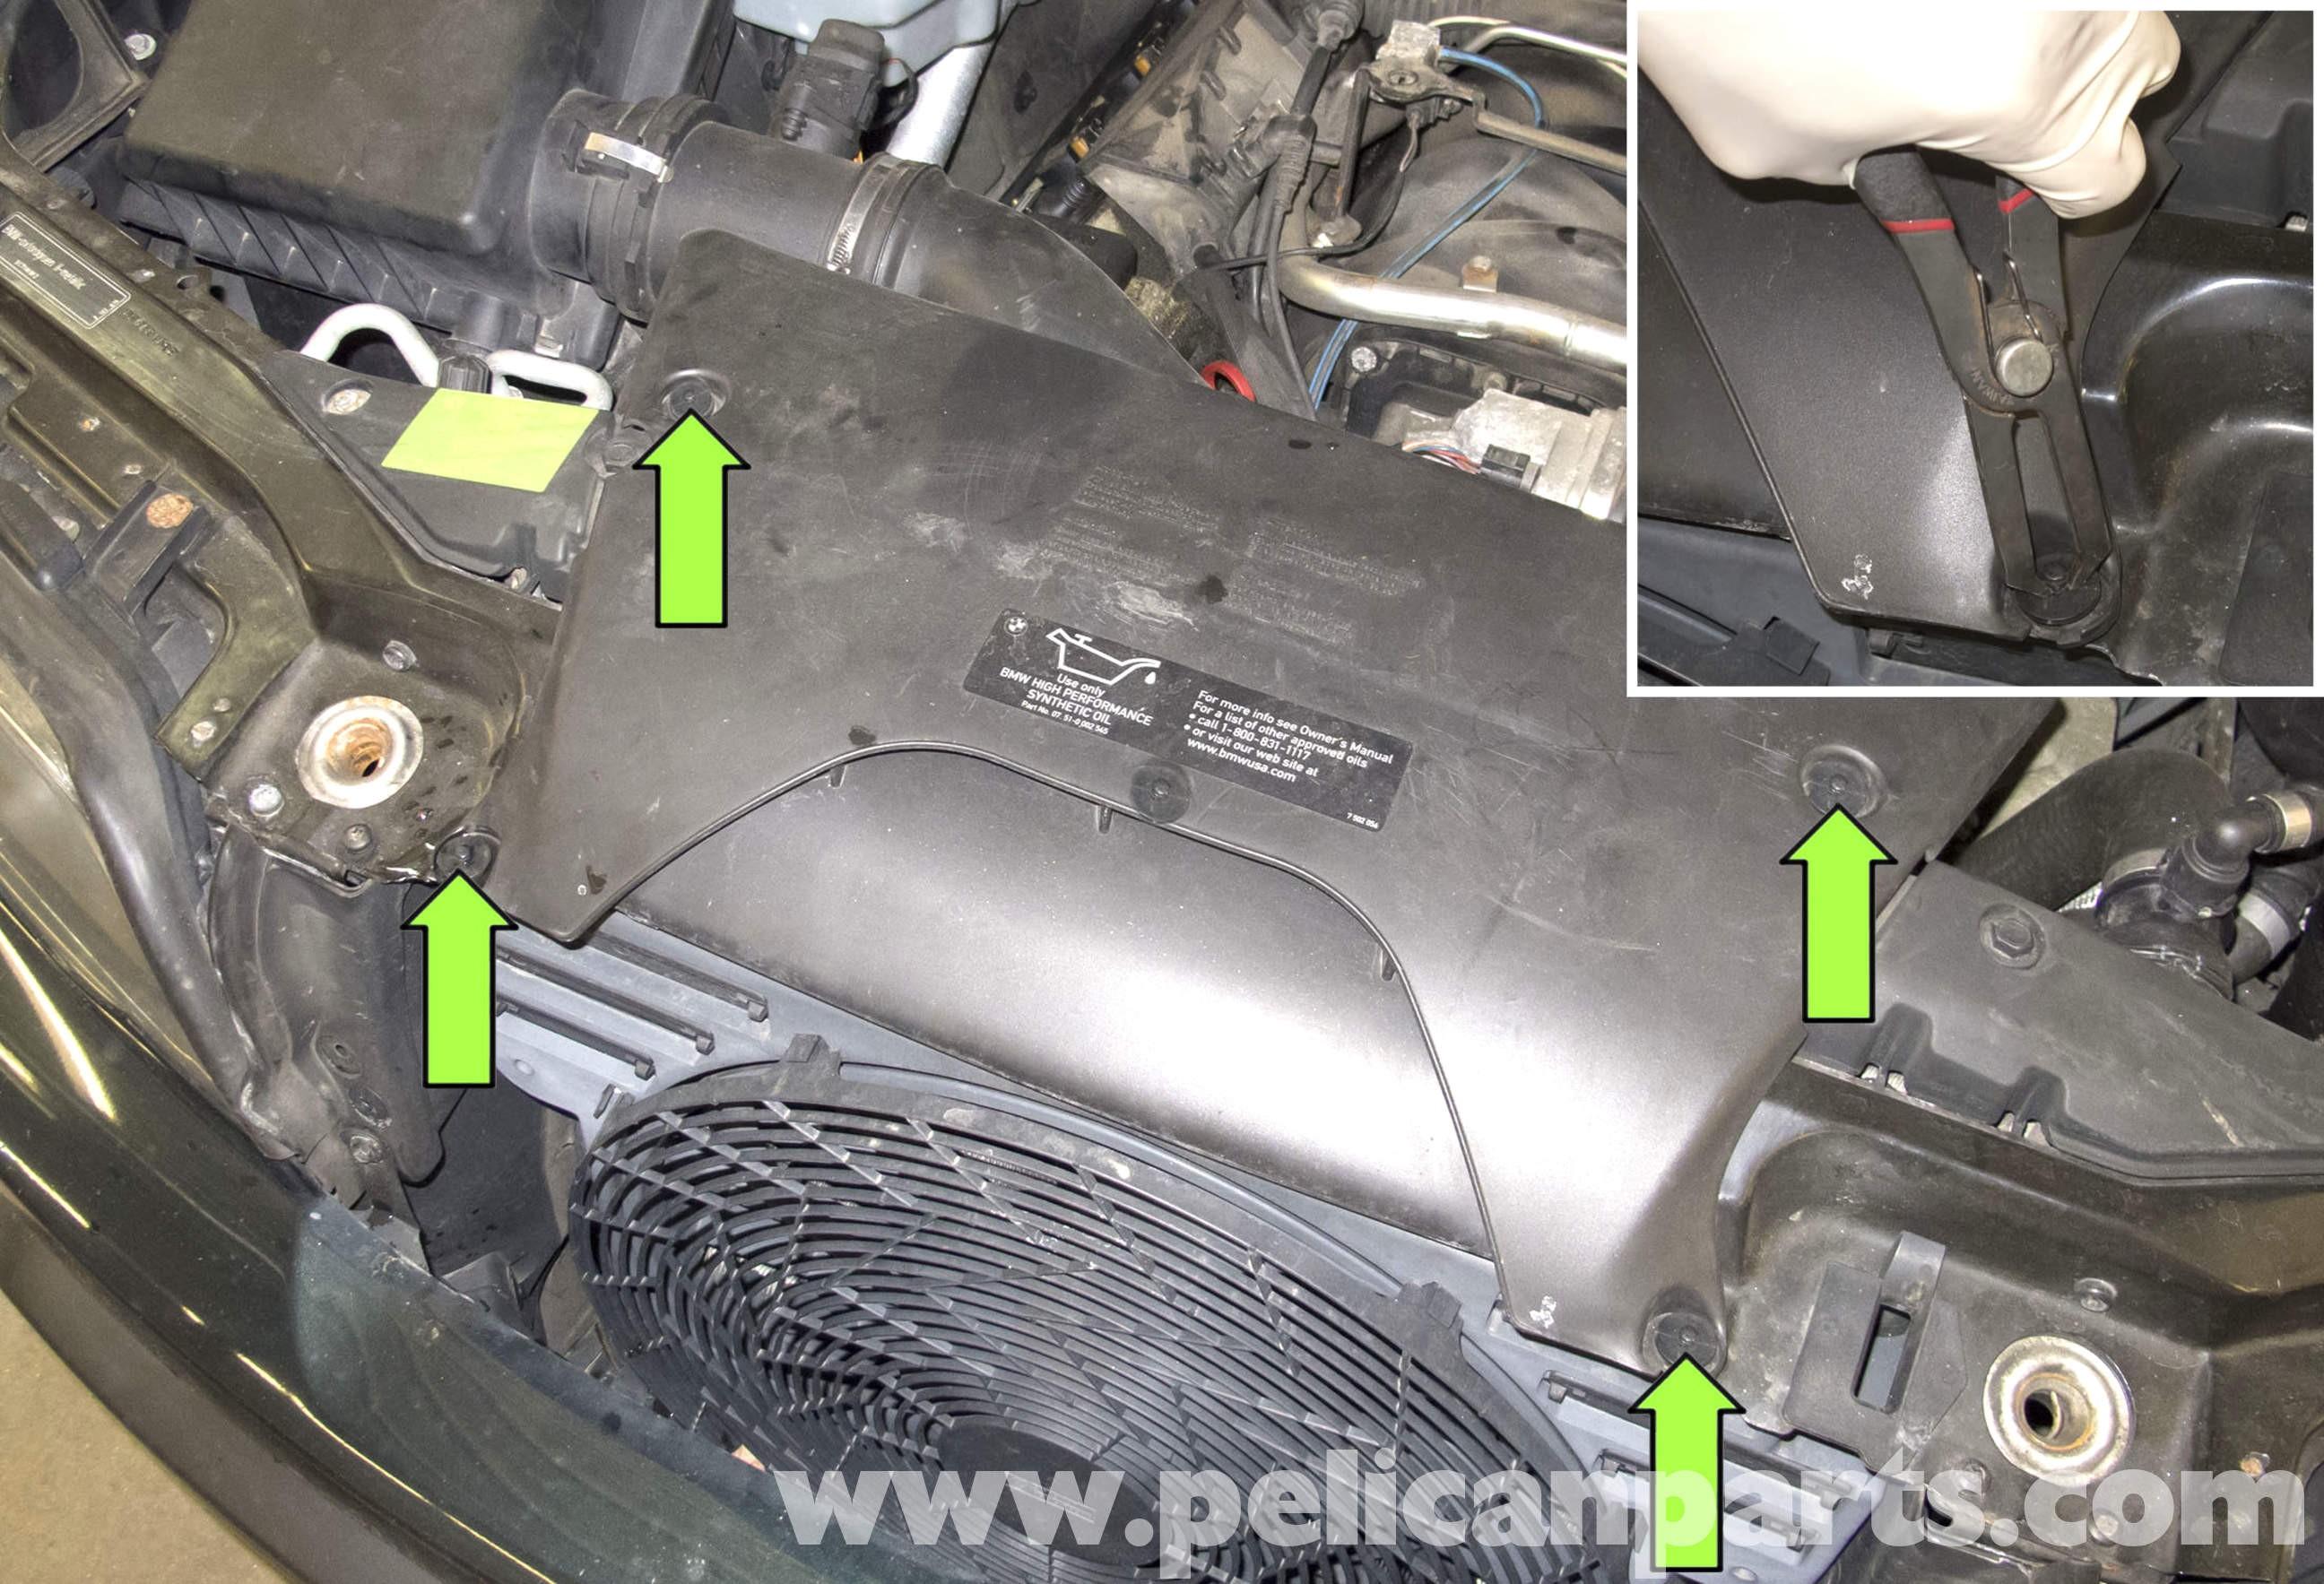 Car Radiator Diagram Bmw X5 Engine Cooling Fan Replacement E53 2000 2006 Of Car Radiator Diagram